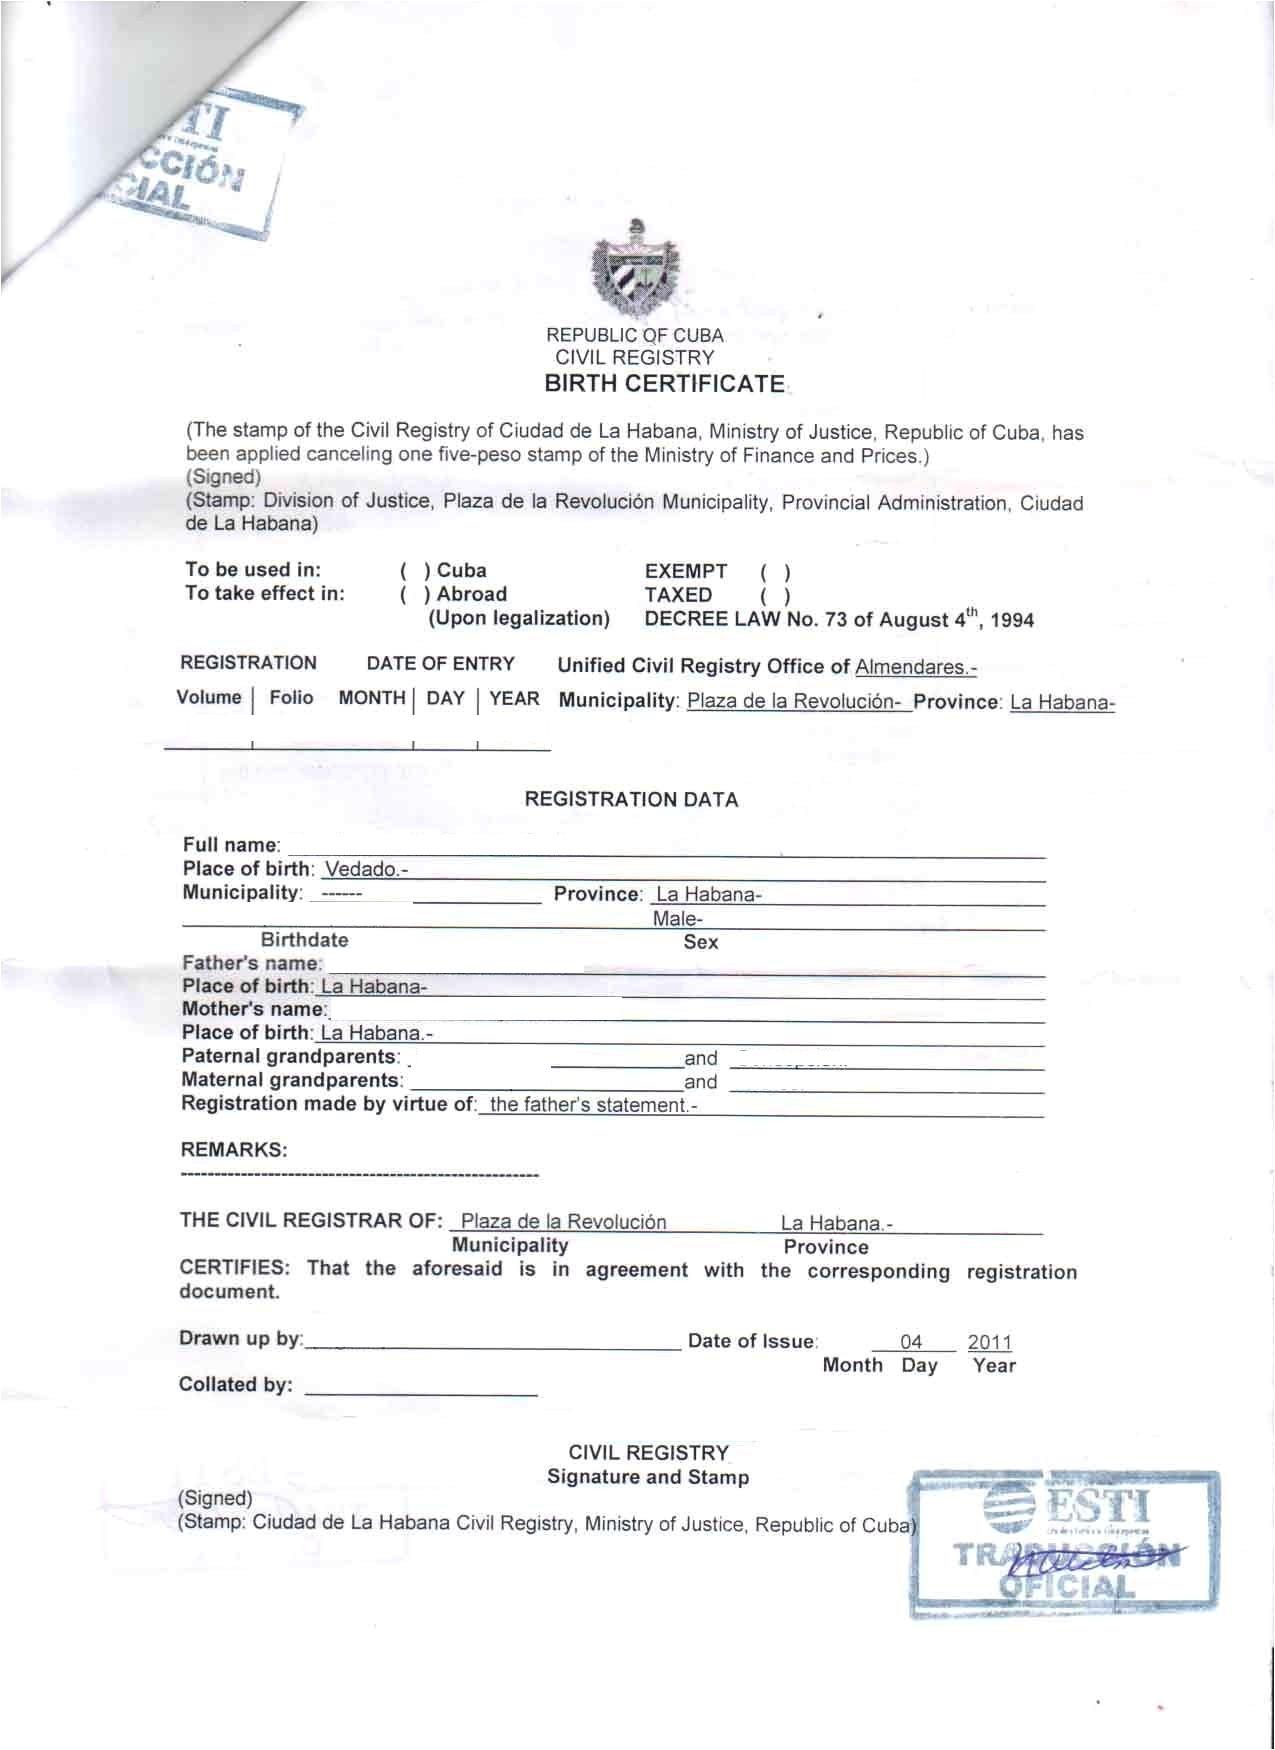 birth certificate translation template english to italian